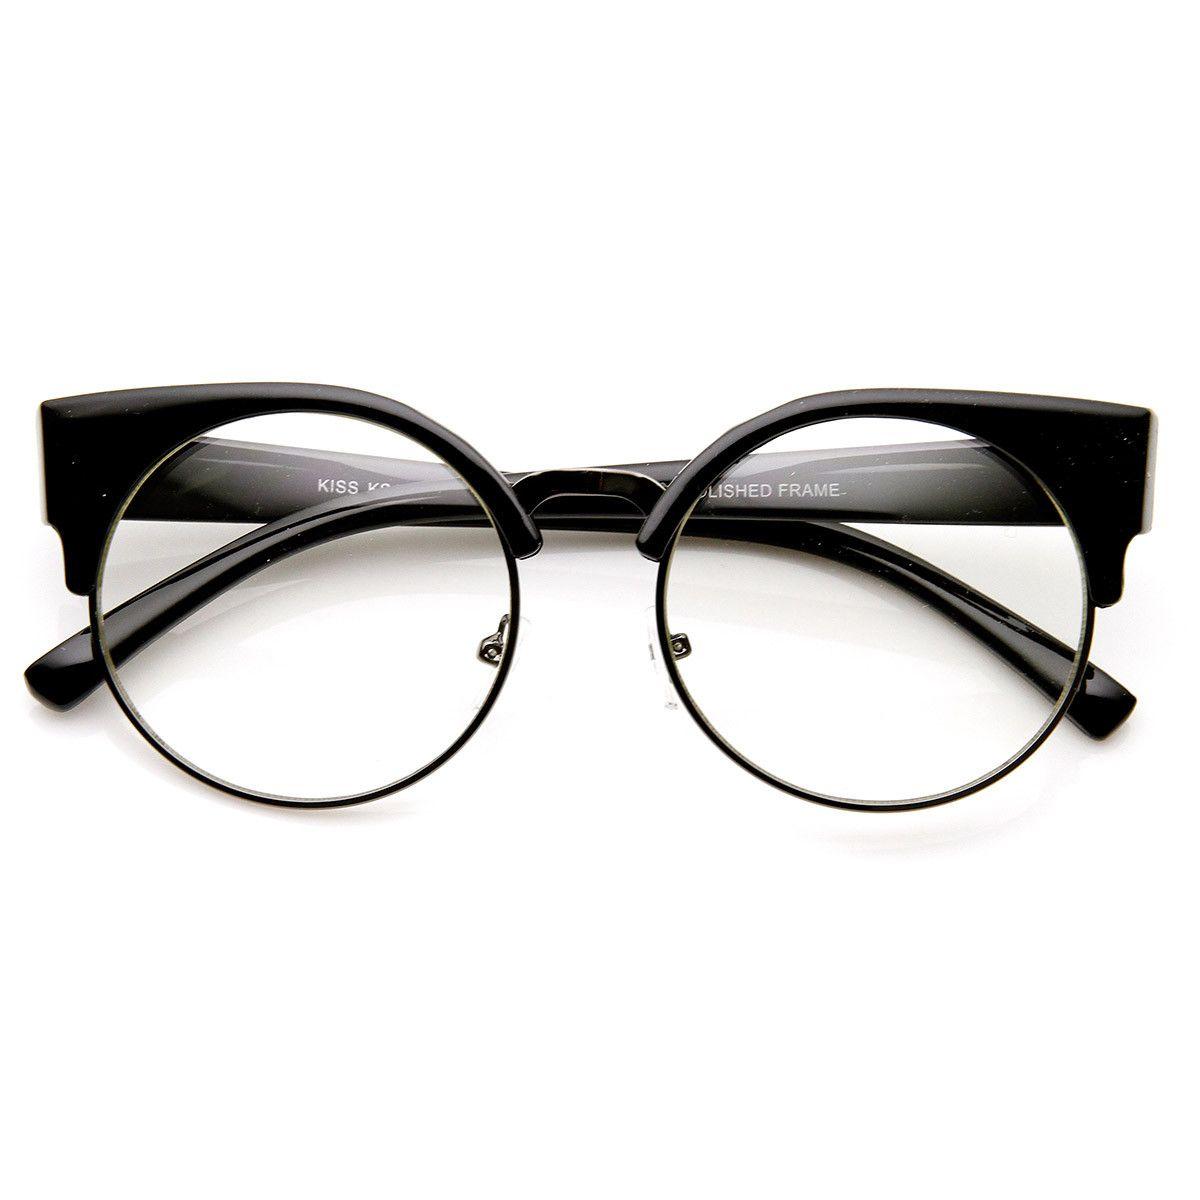 1b28617137 Womens Half Frame Semi-Rimless Clear Lens Cat eye Round Glasses ...